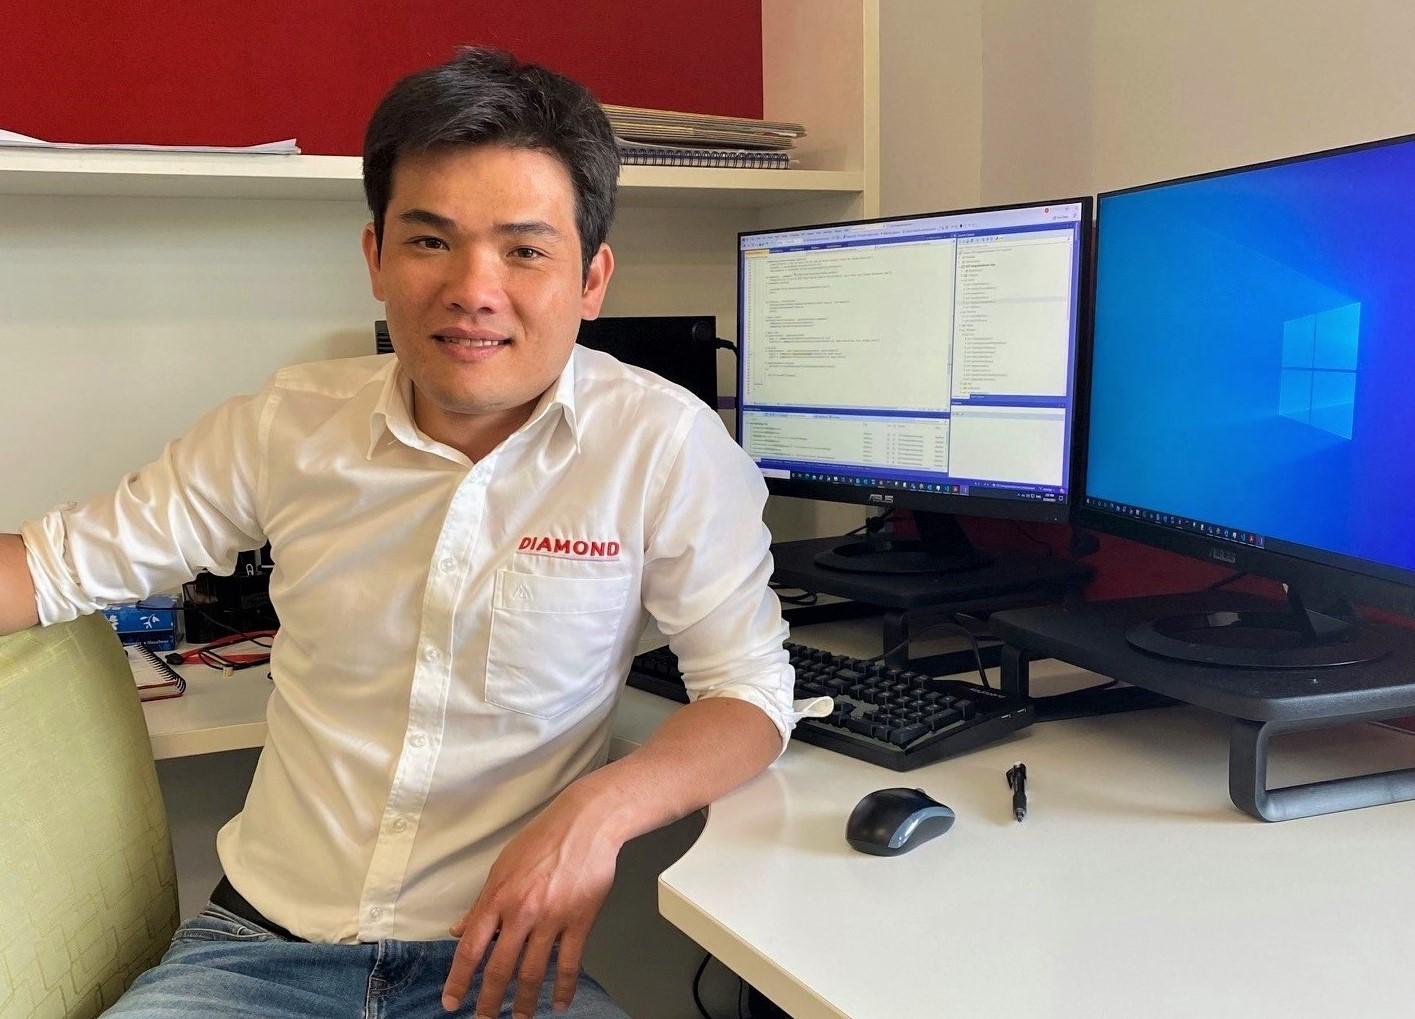 Diamond IT's newest Azure Solutions Architect Expert